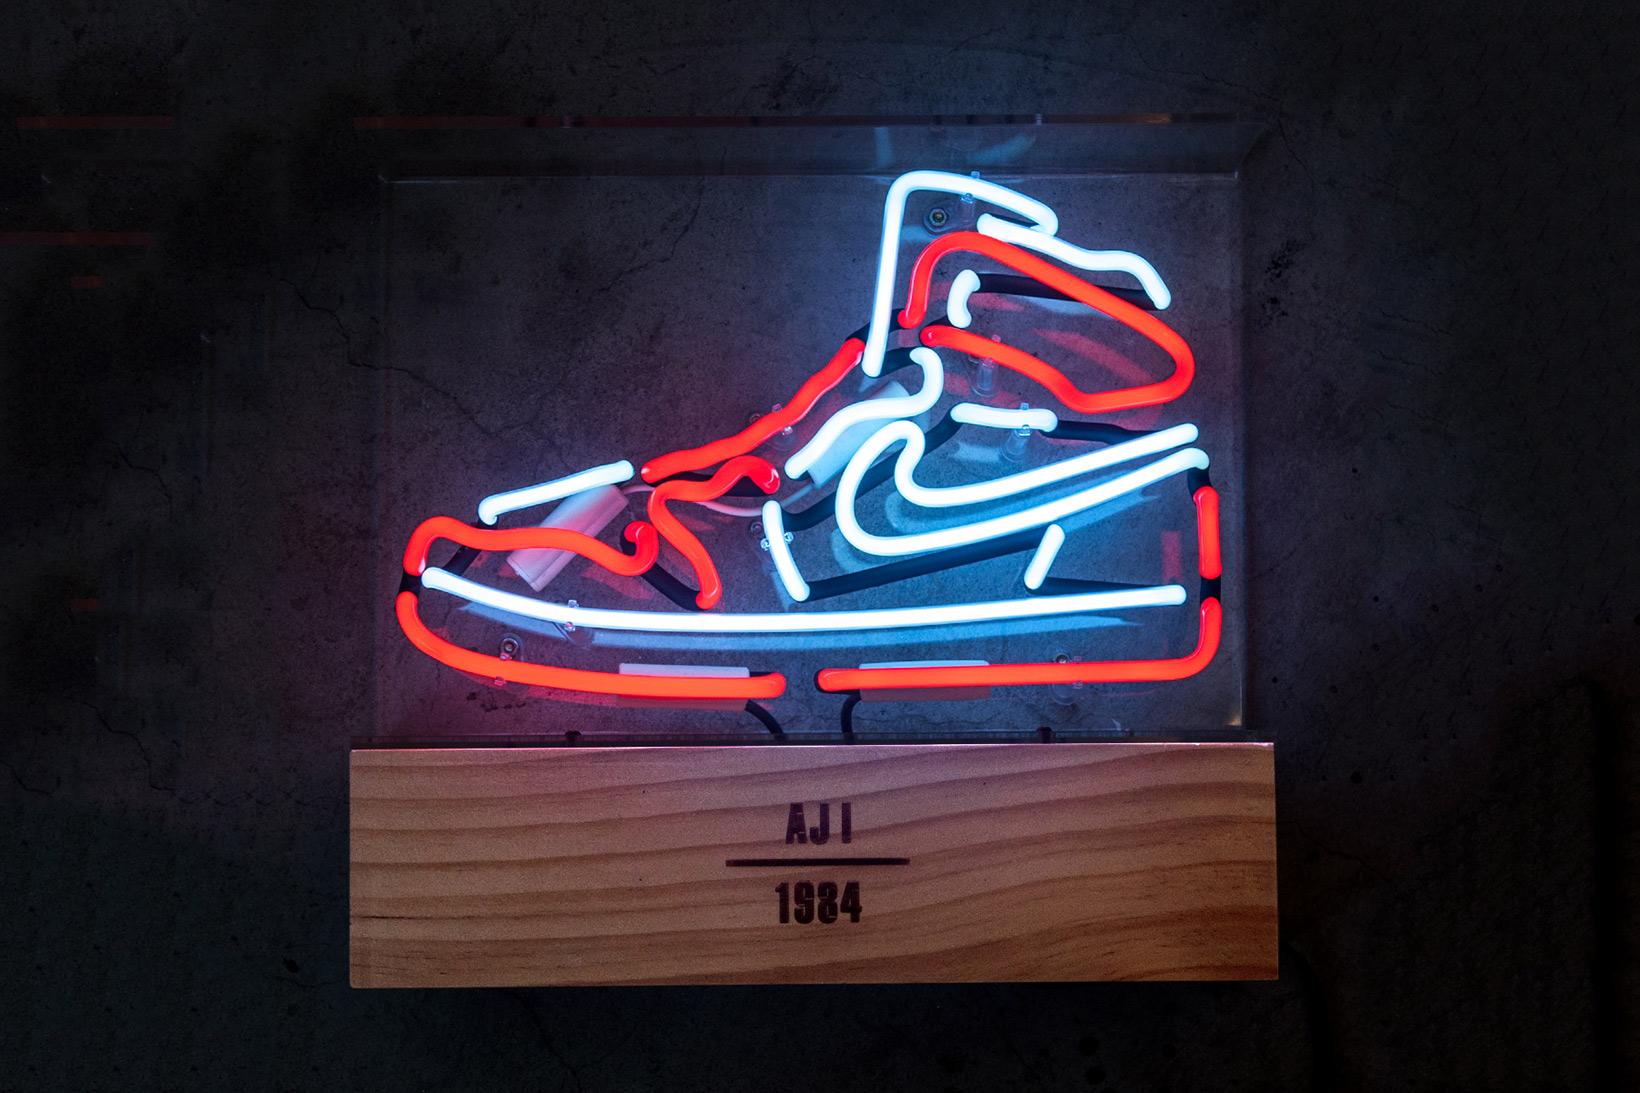 Air Jordan 1 Neon Light